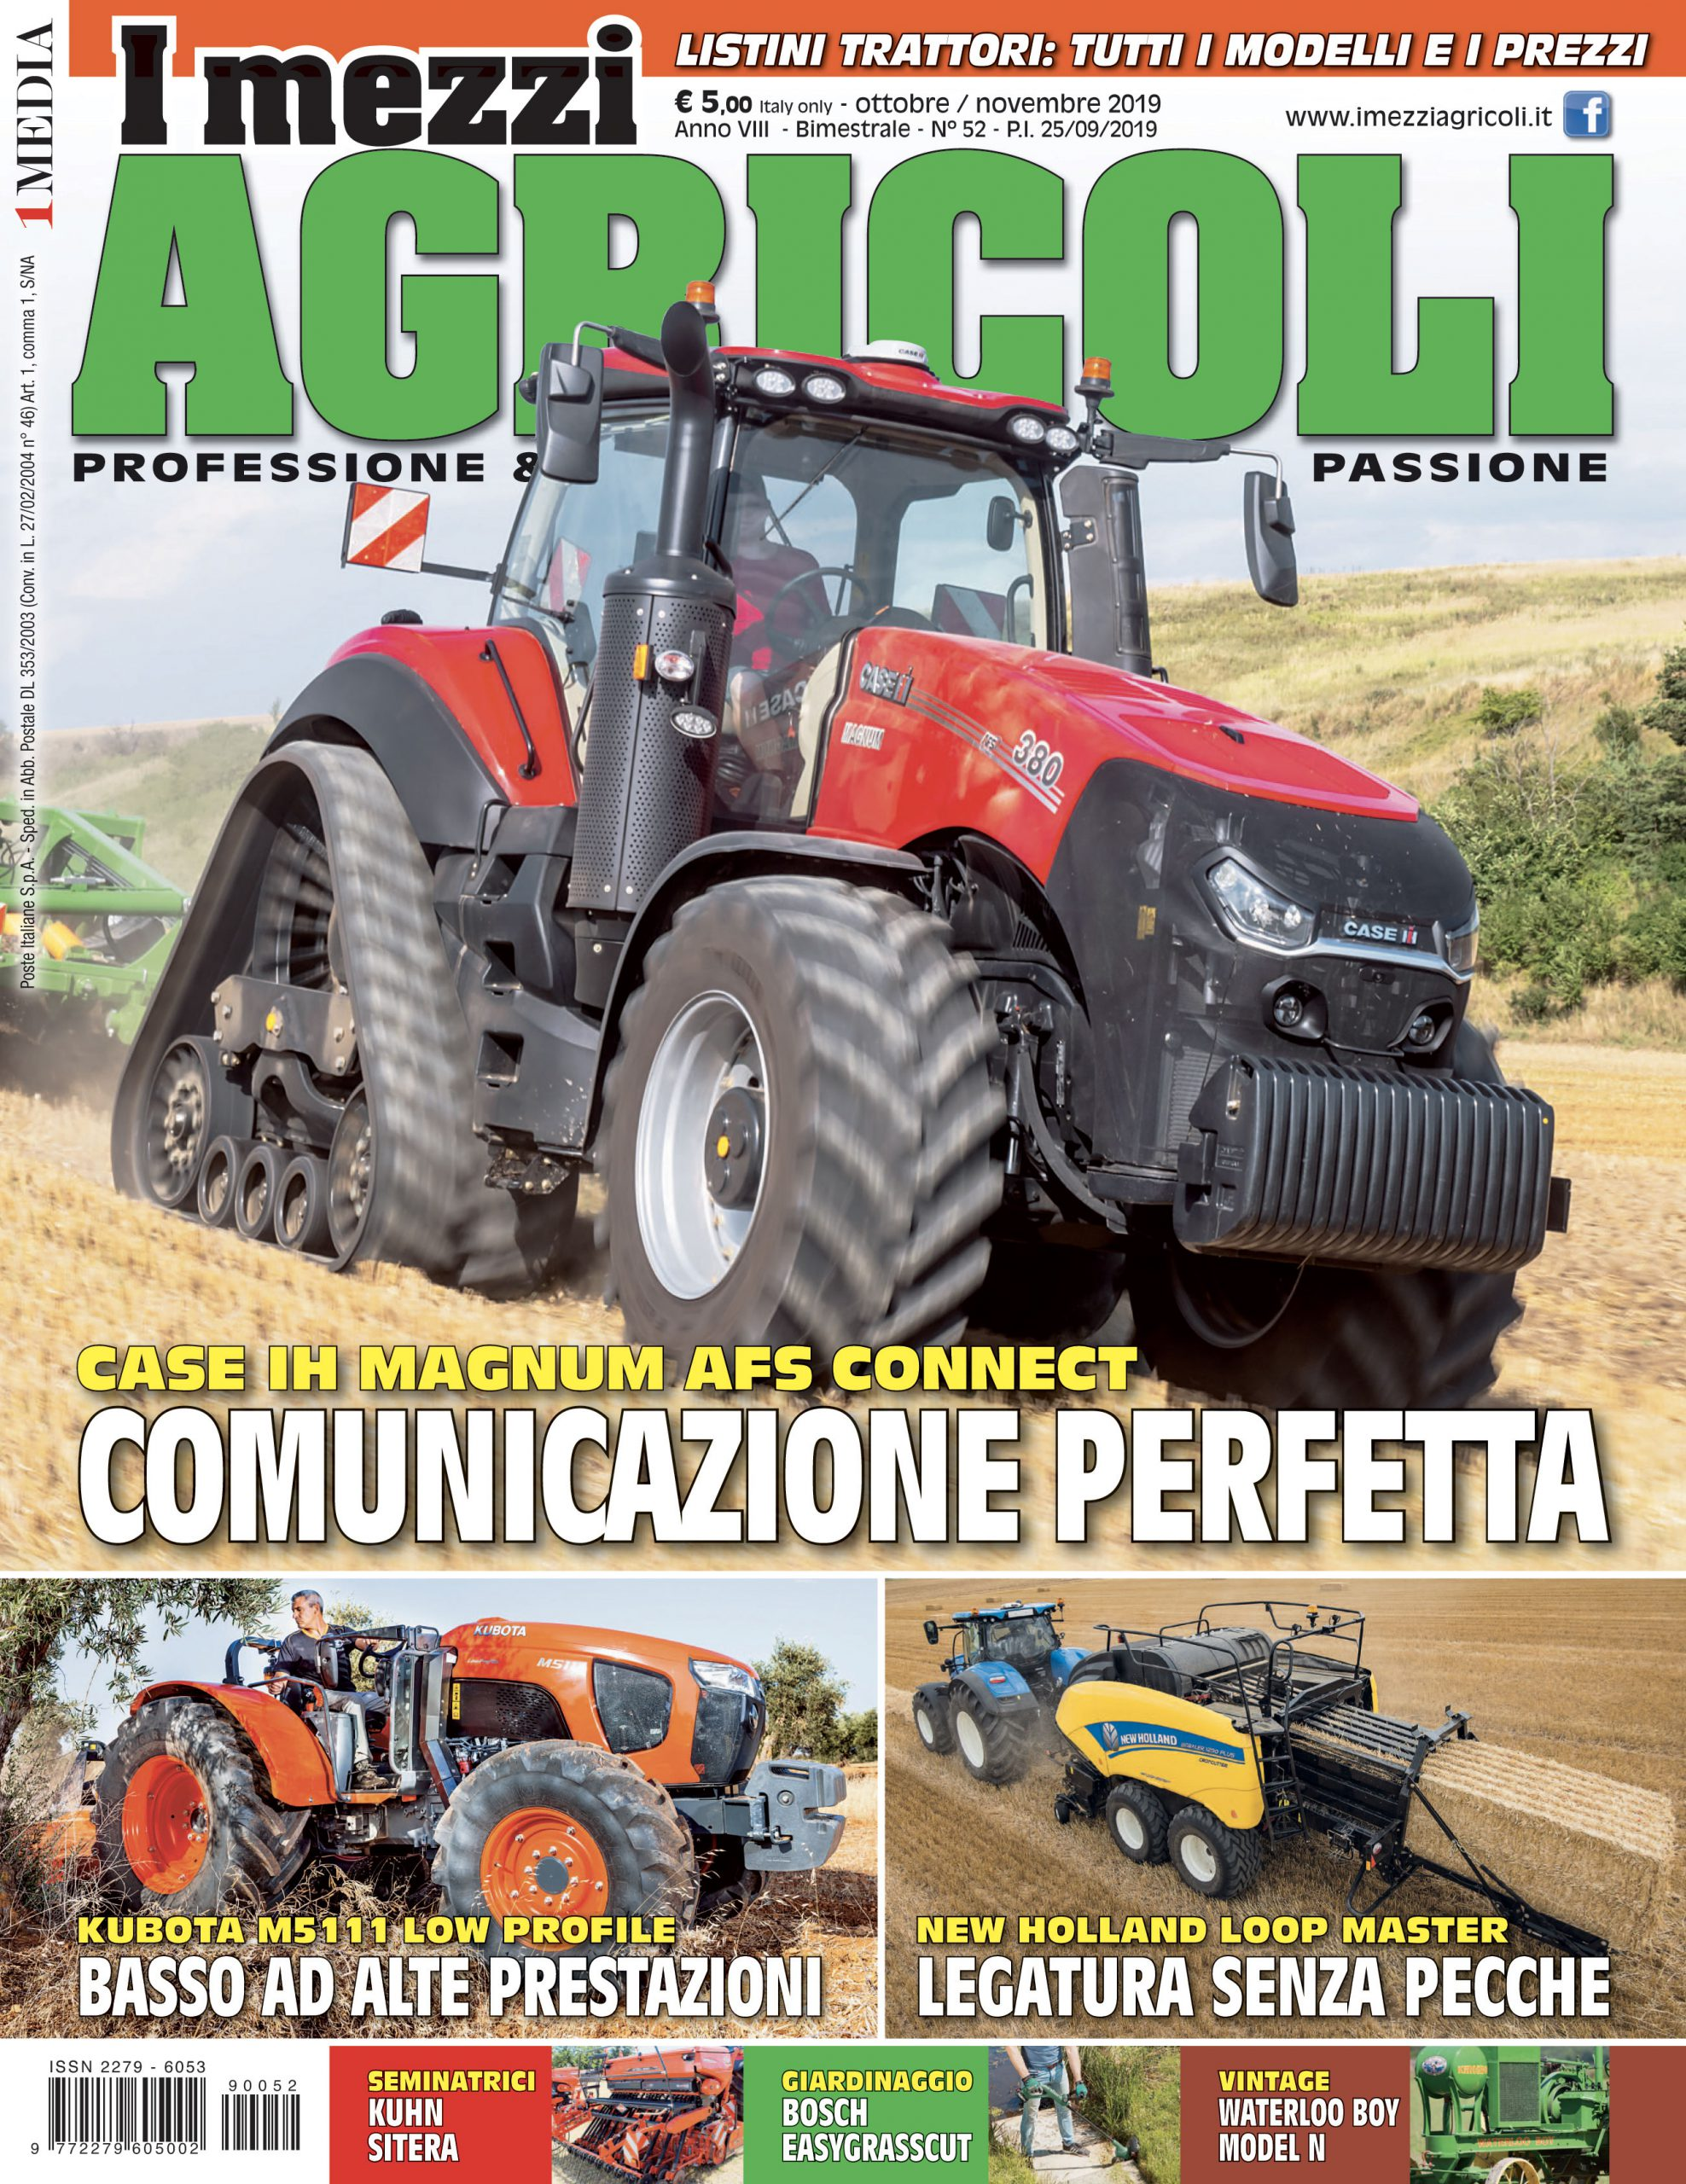 I Mezzi Agricoli n.52